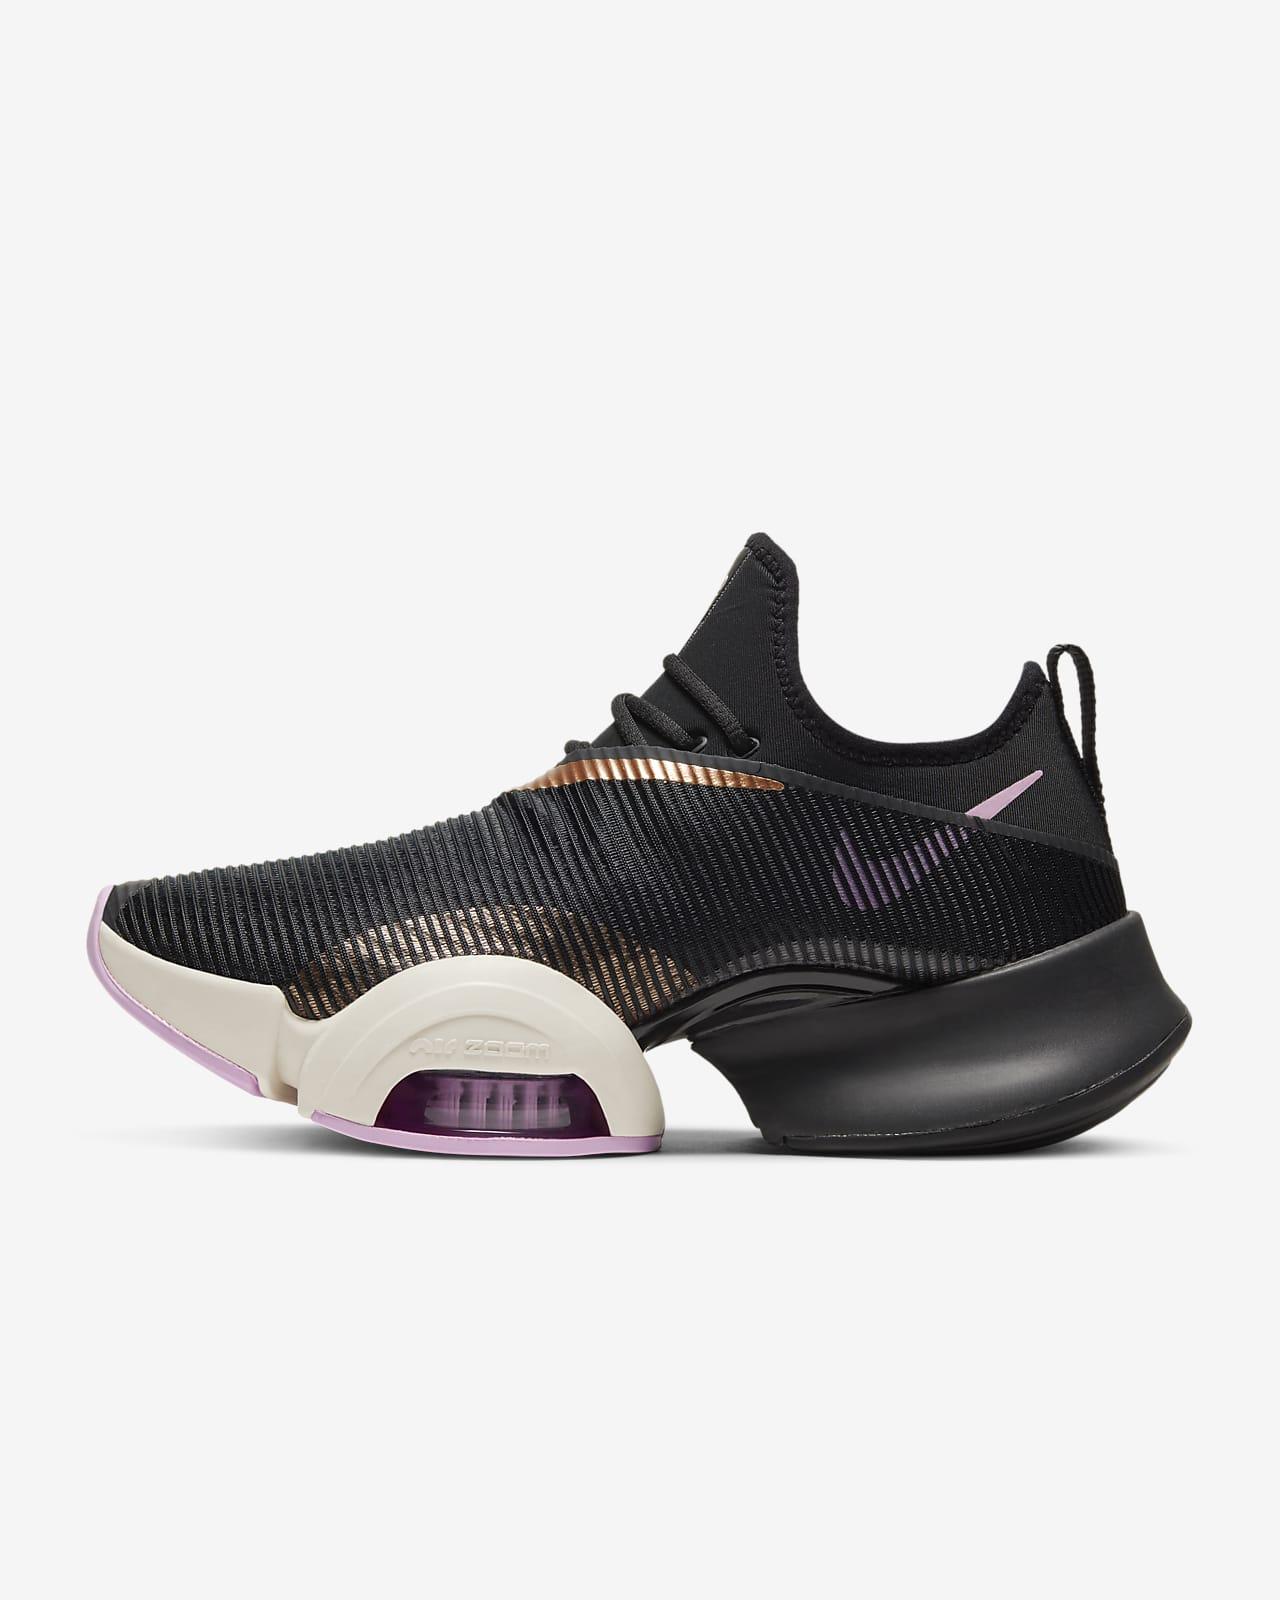 brindis sin cable Señal  Calzado para mujer Nike Air Zoom SuperRep HIIT Class. Nike.com